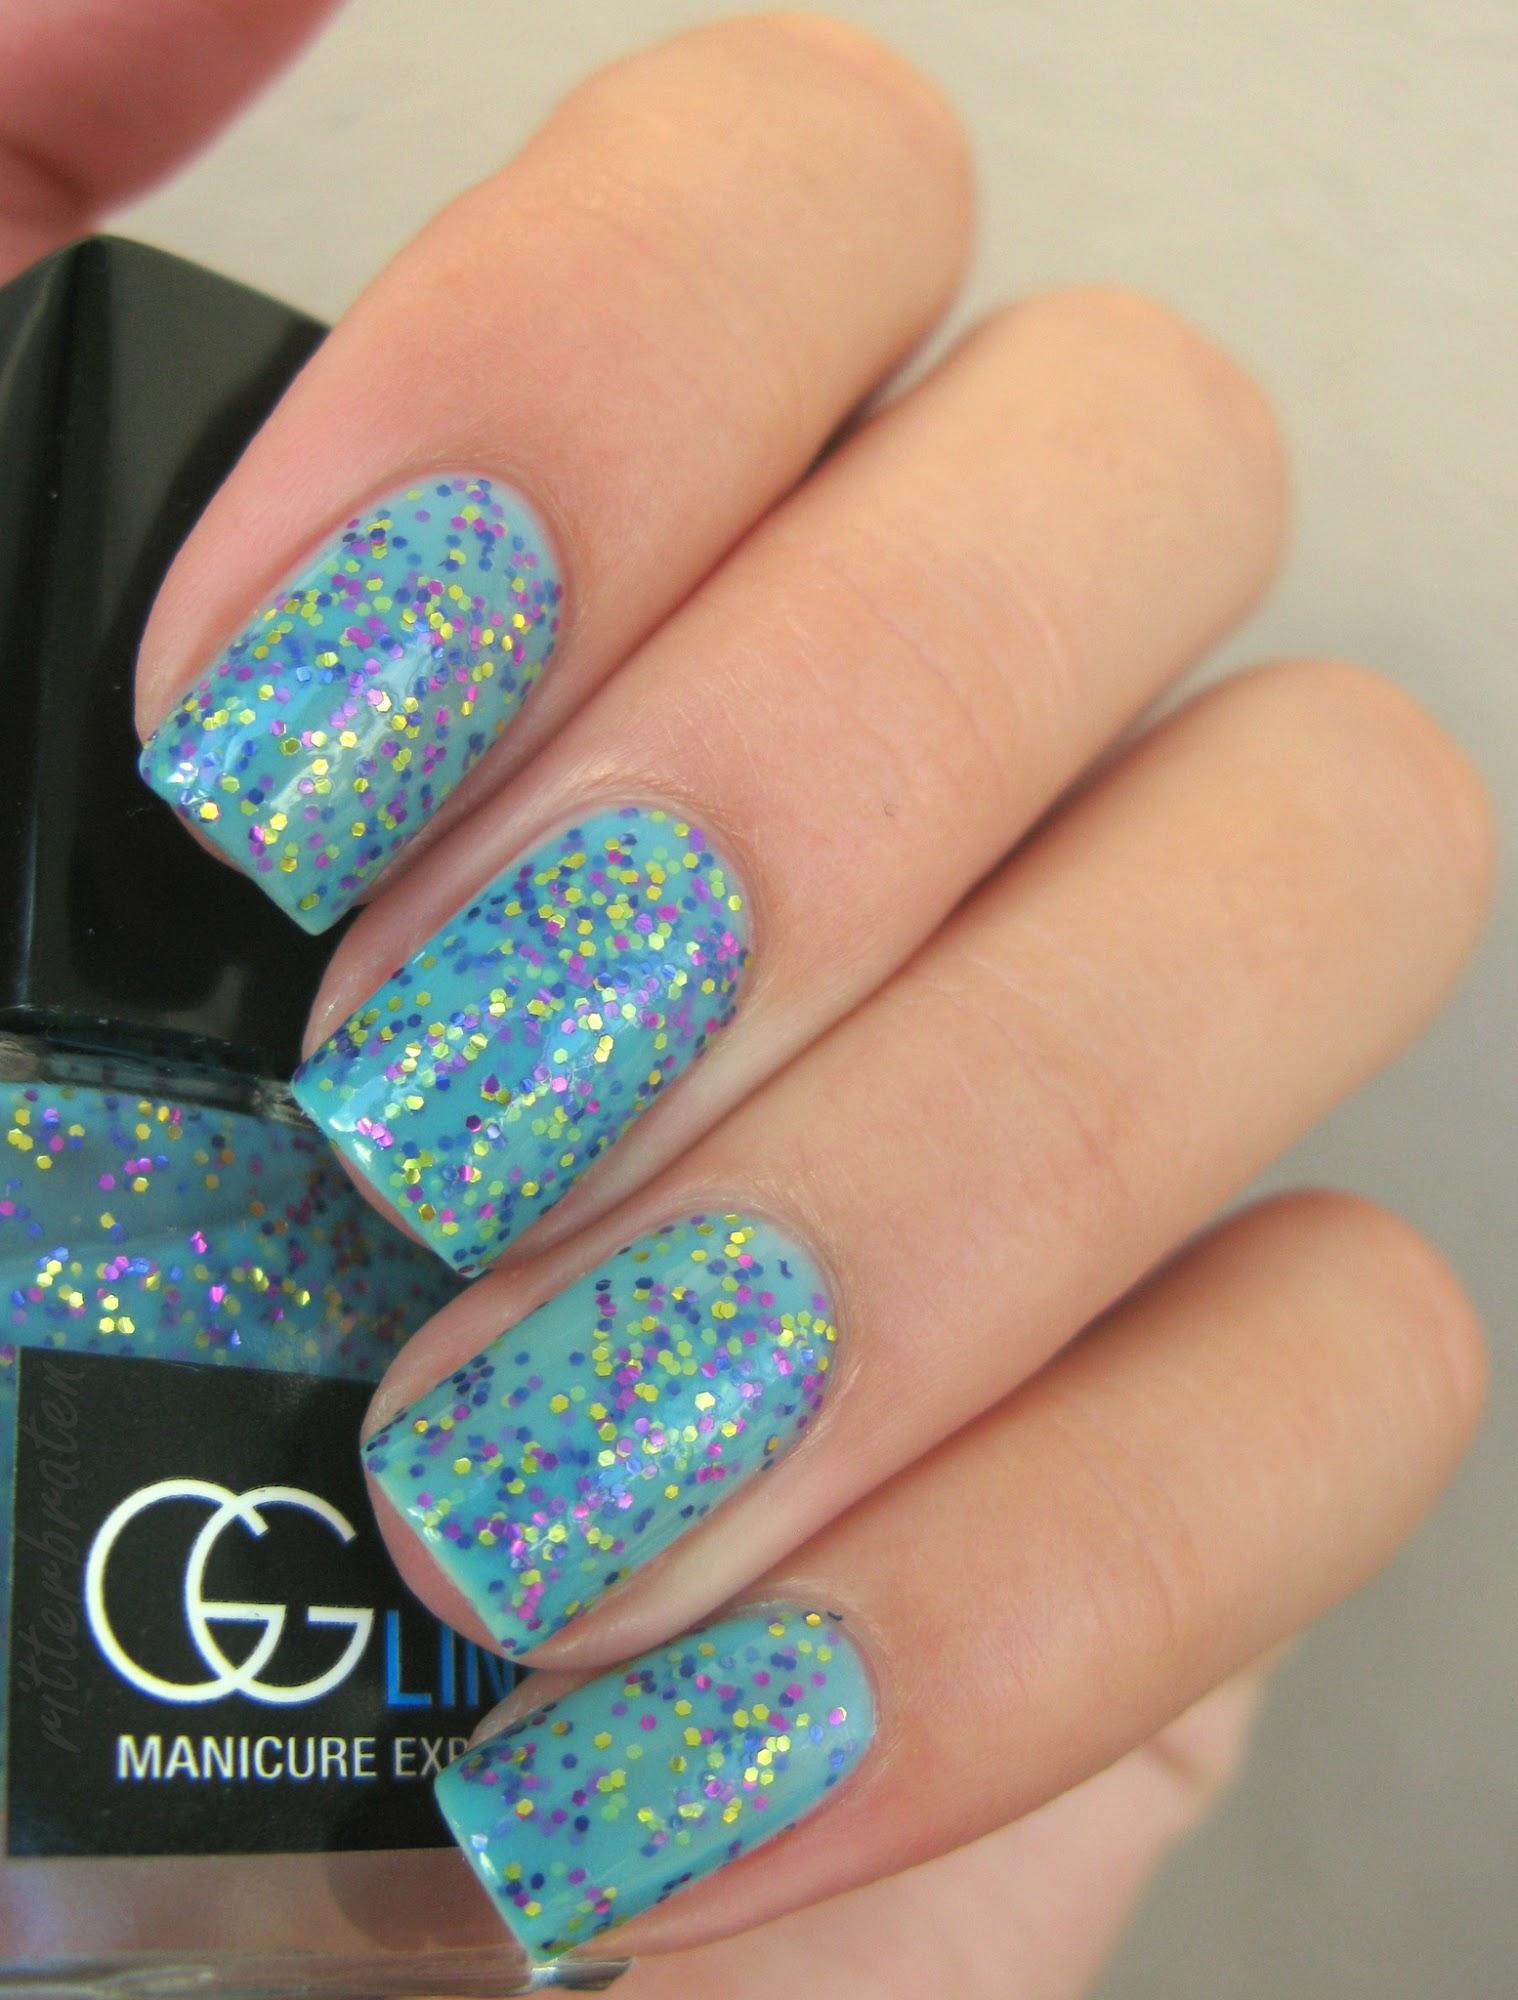 gg line nail polish